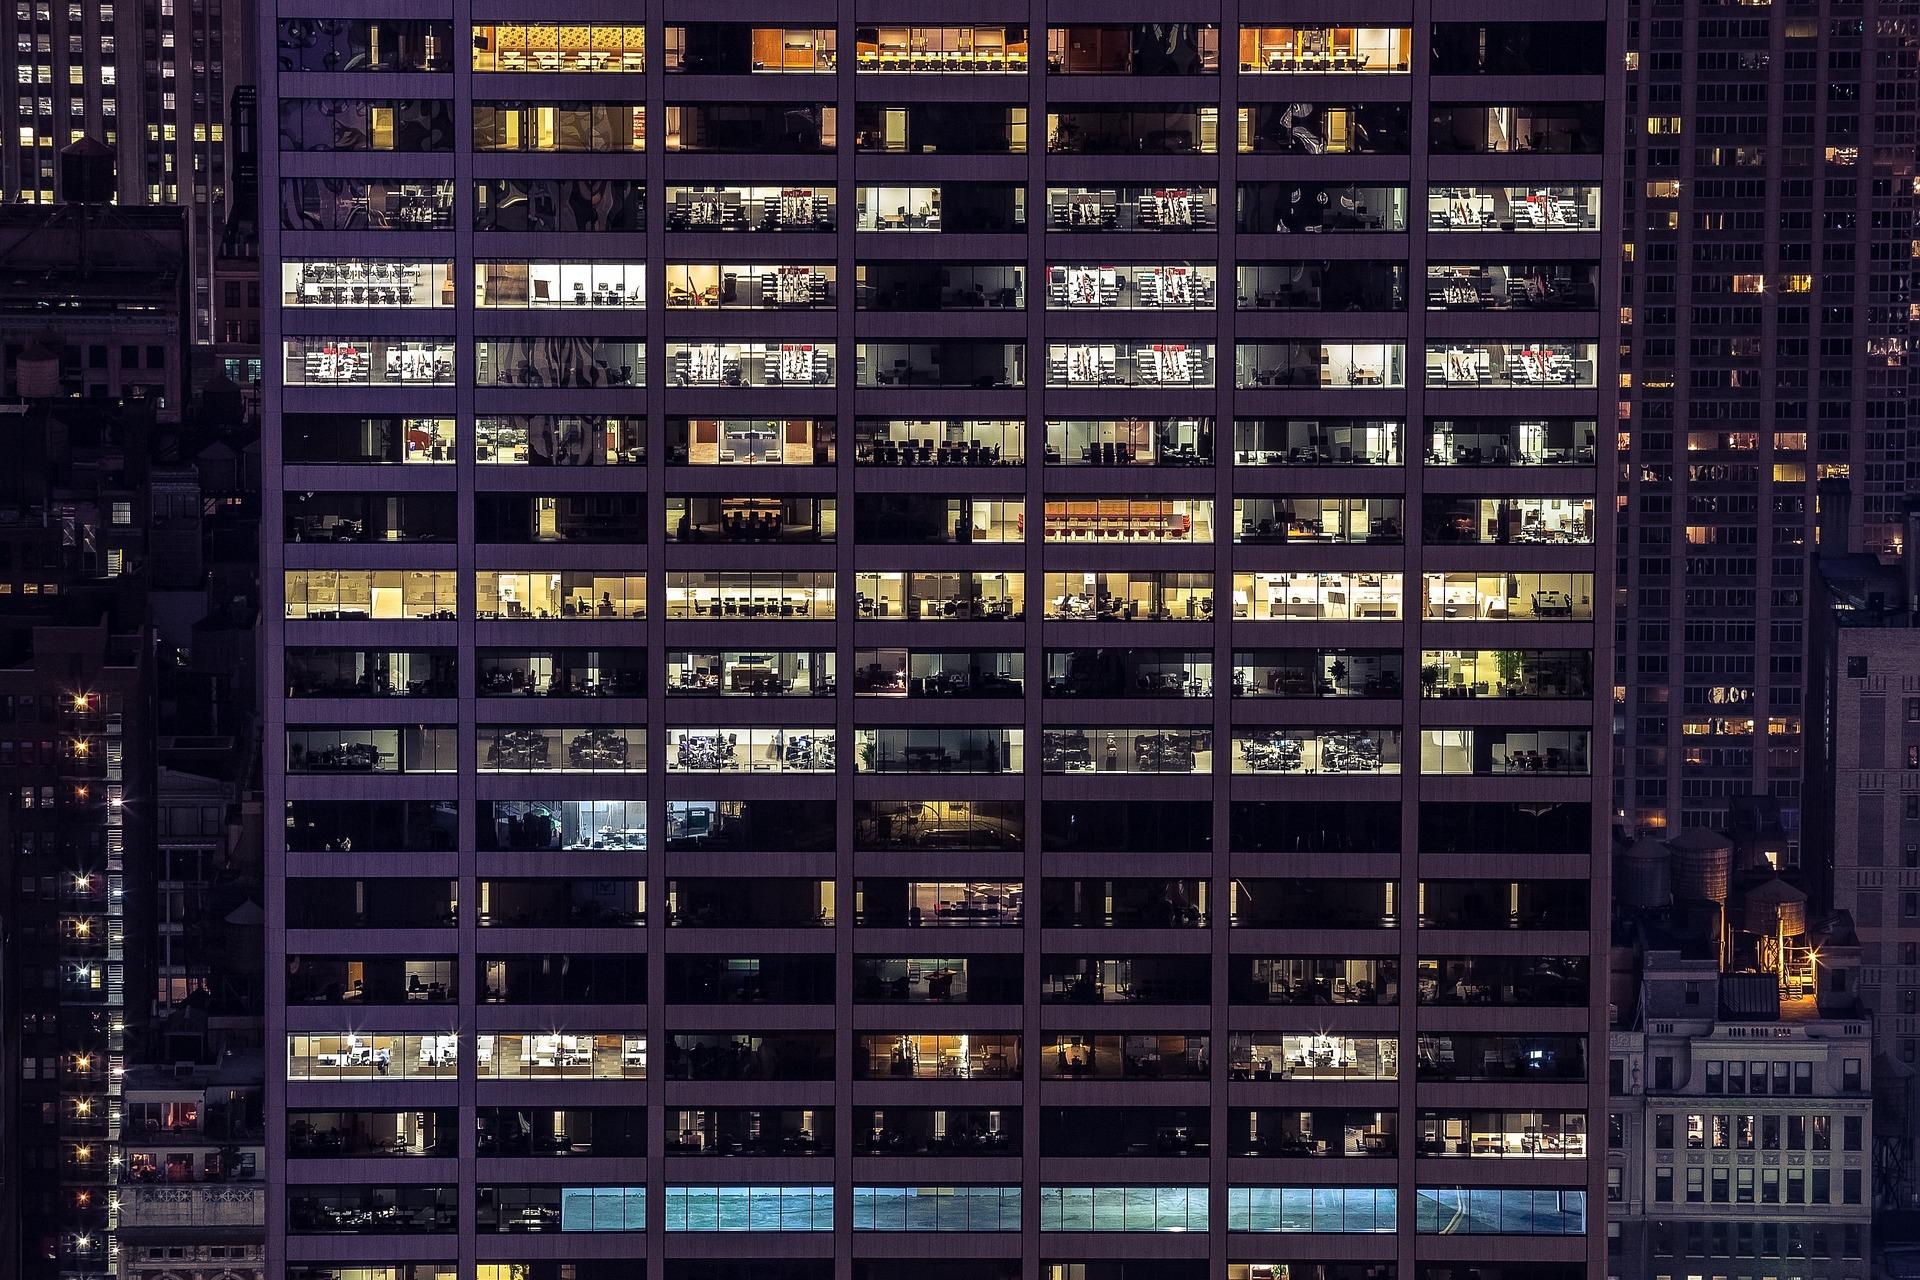 building-1210022_1920